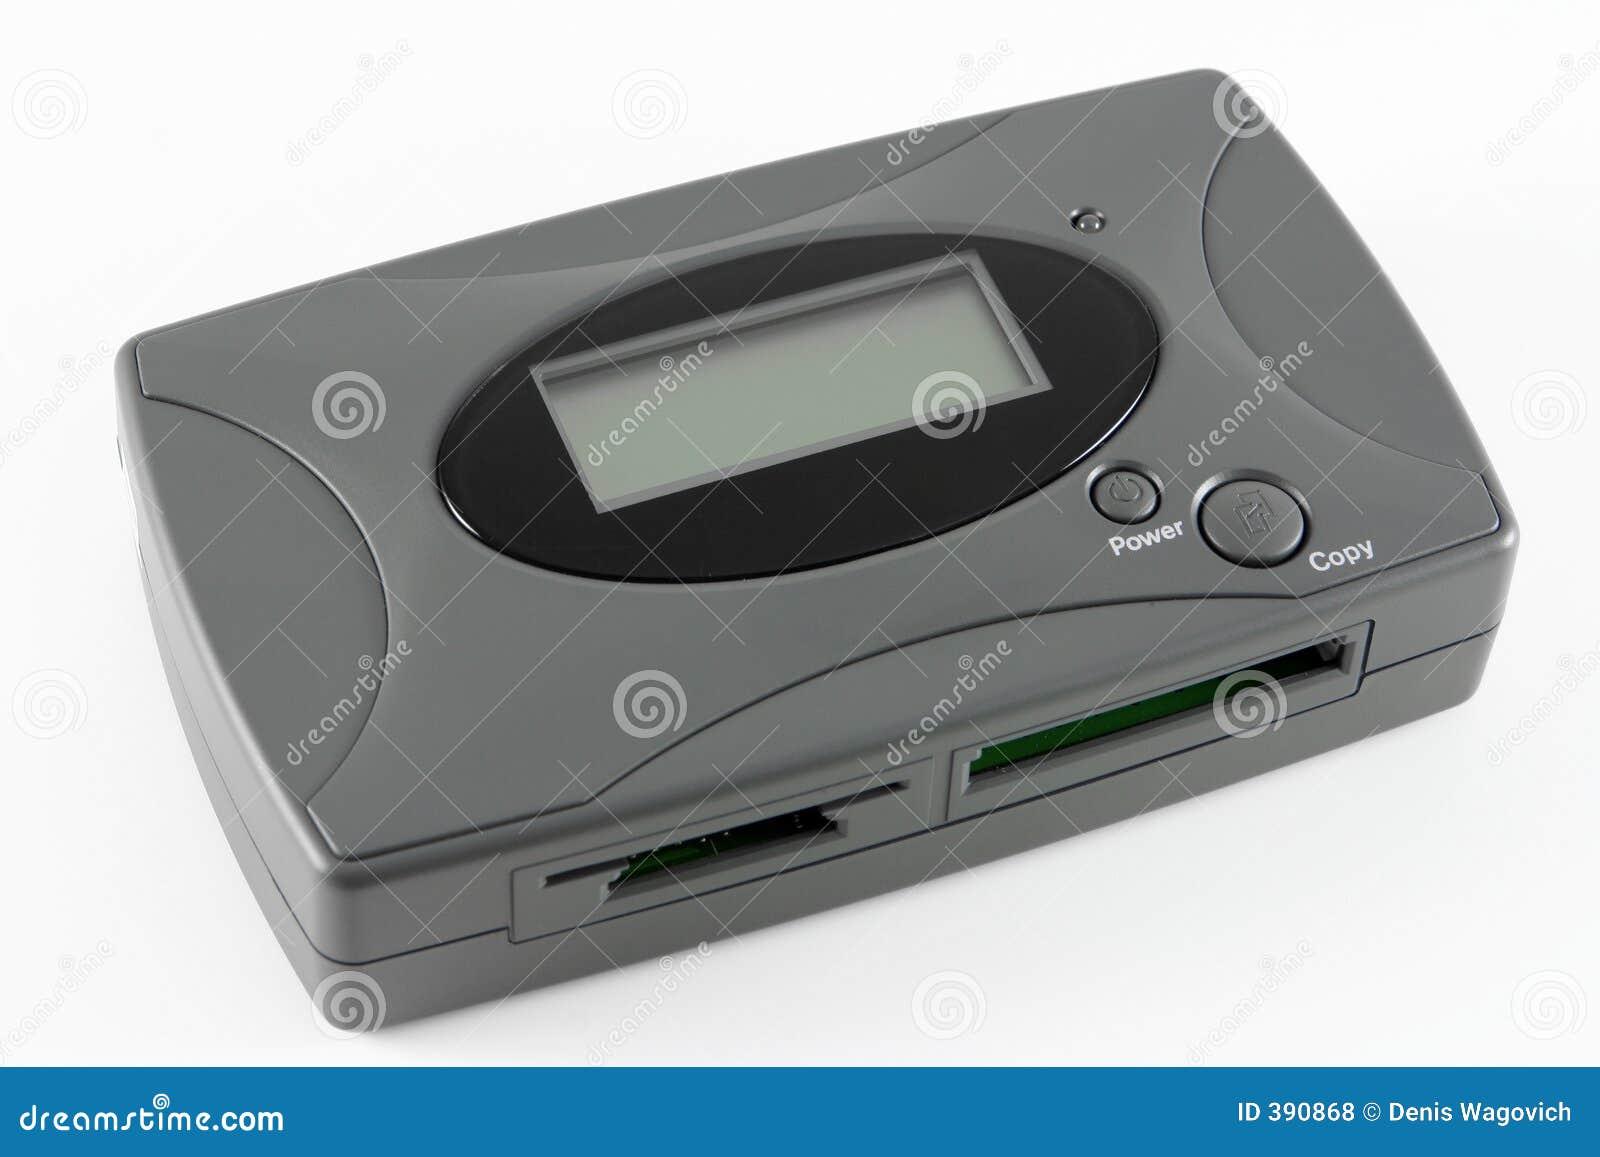 Dispositif de mémorisation